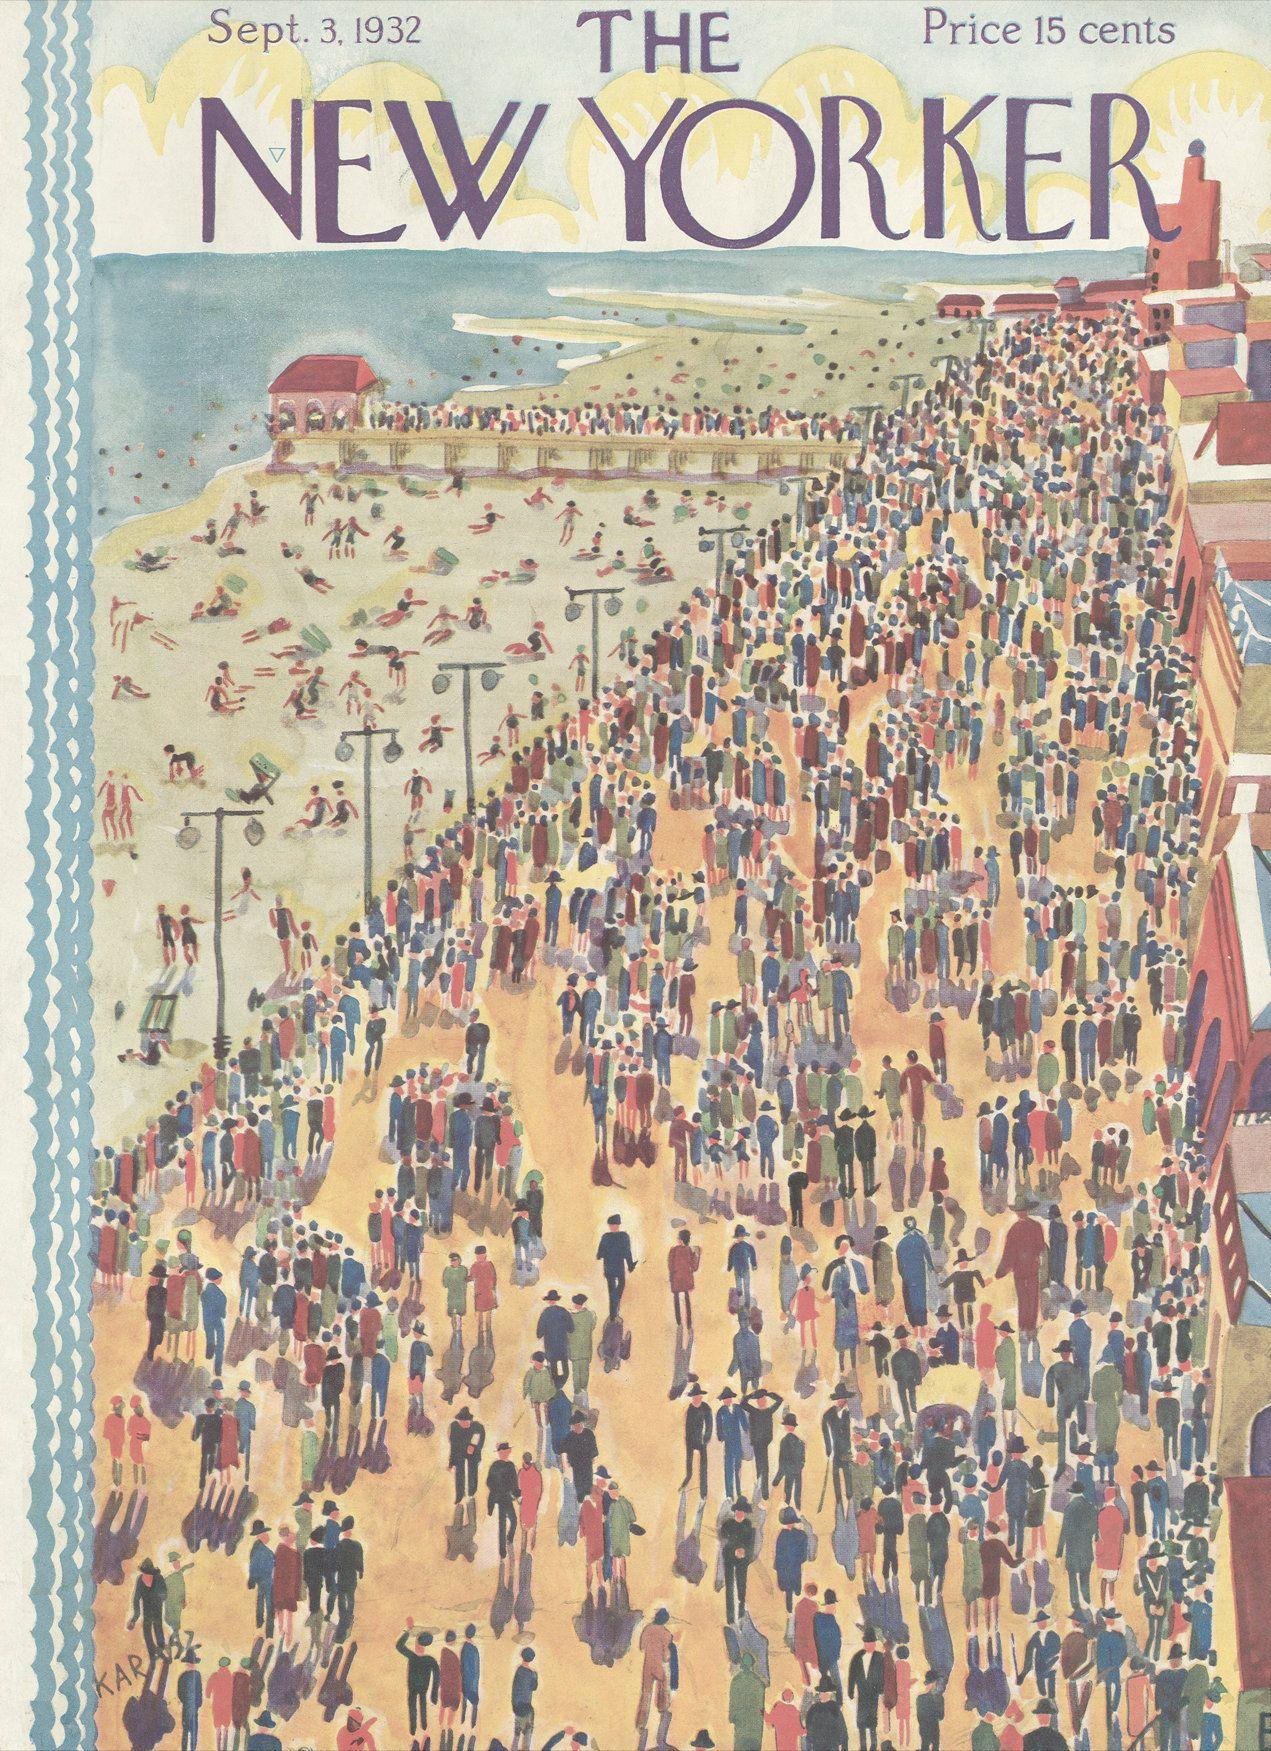 The New Yorker - Saturday, September 3, 1932 - Issue # 394 - Vol. 8 - N° 29 - Cover by :Ilonka Karasz